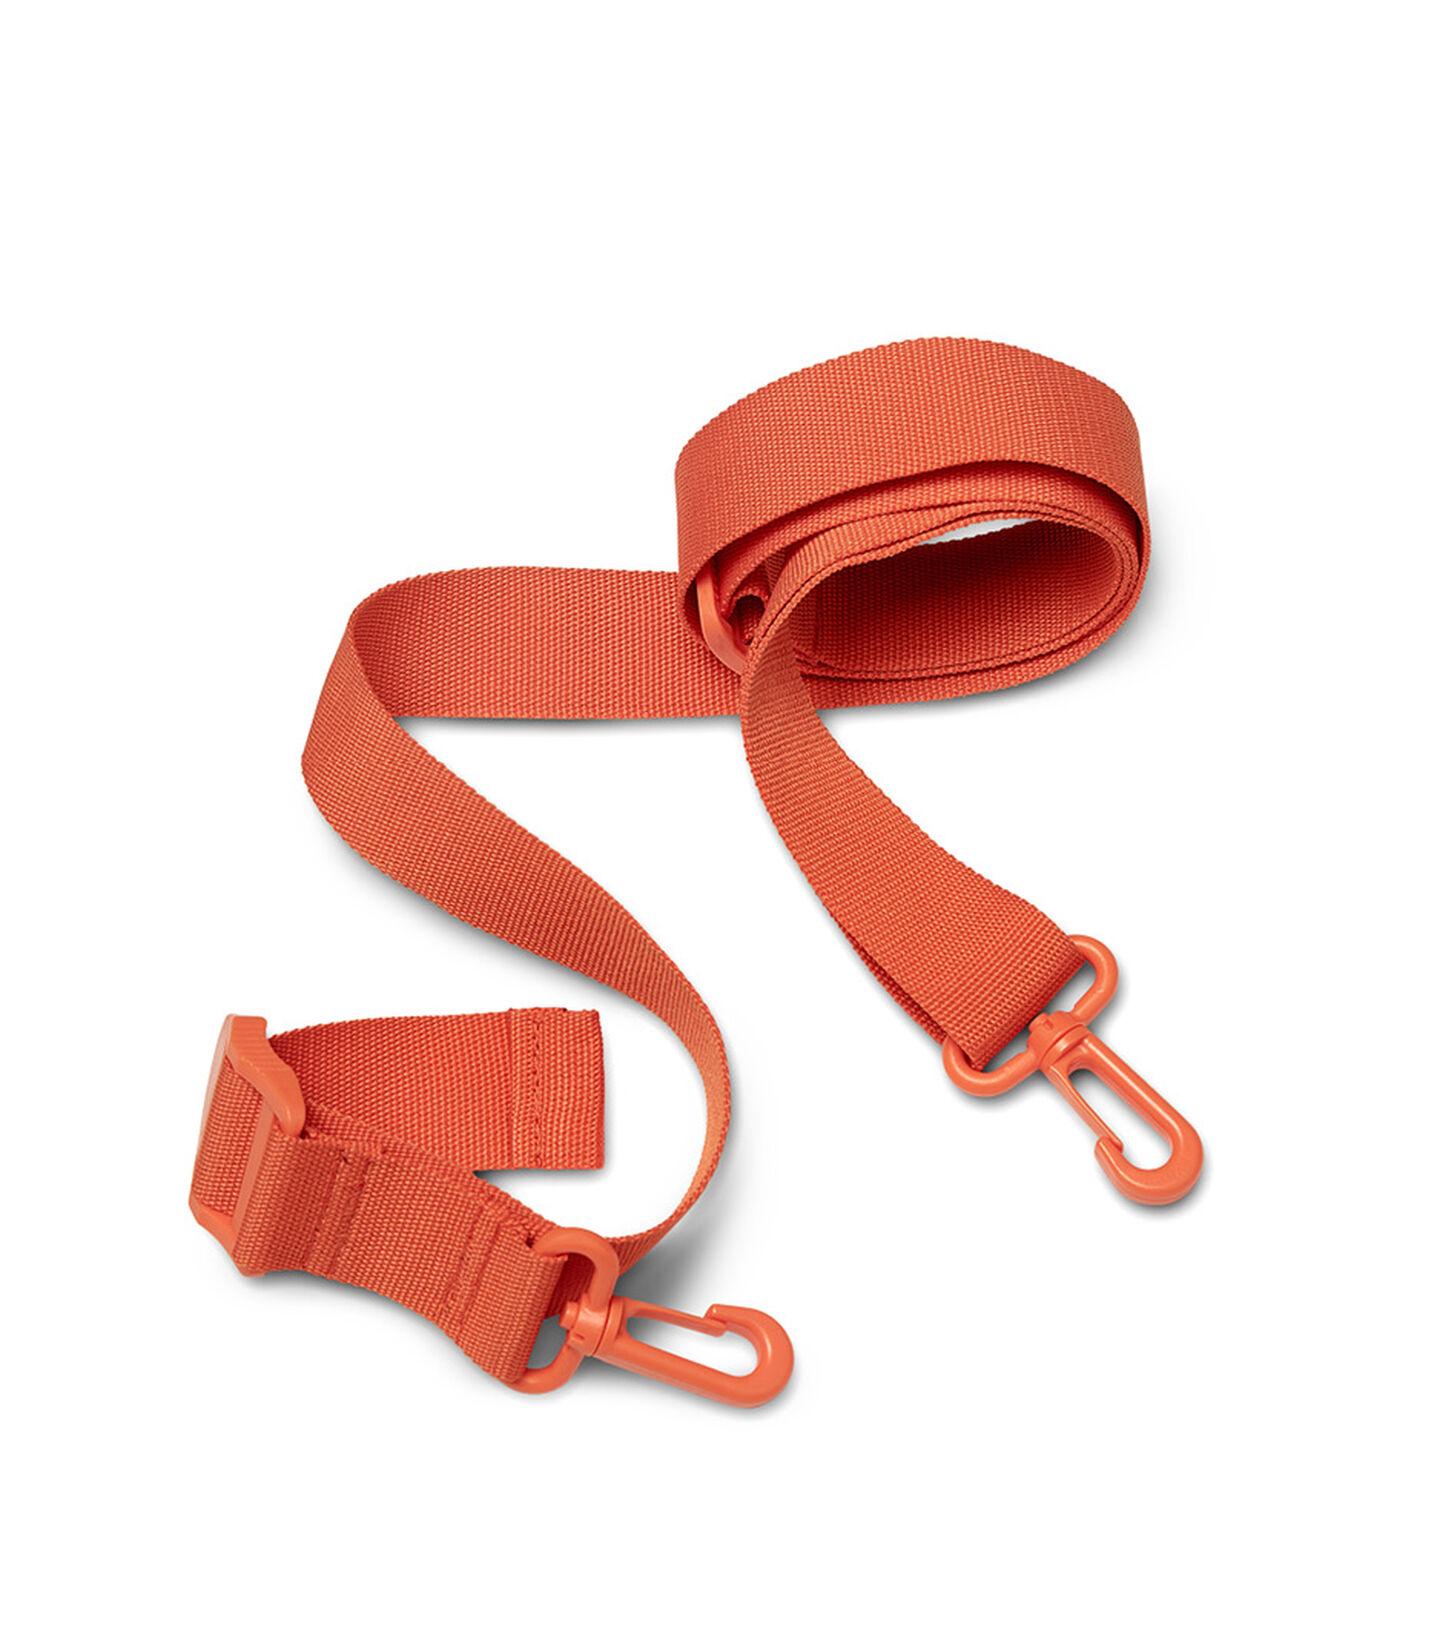 JetKids by Stokke® BedBox Strap Orange, Orange, mainview view 2